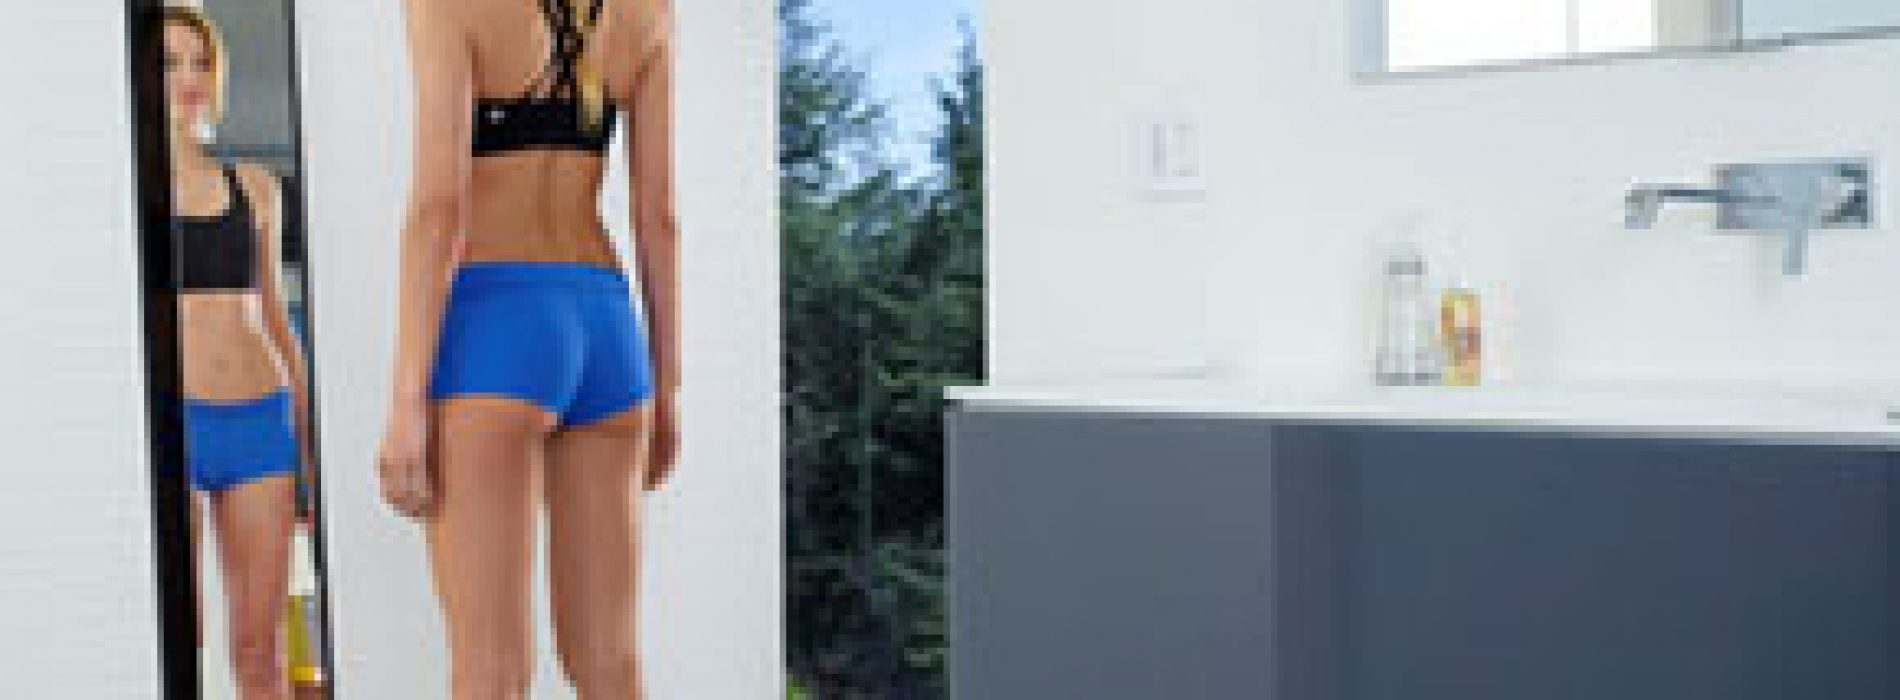 Naked: espejo inteligente que reproduce tu imagen en 3D